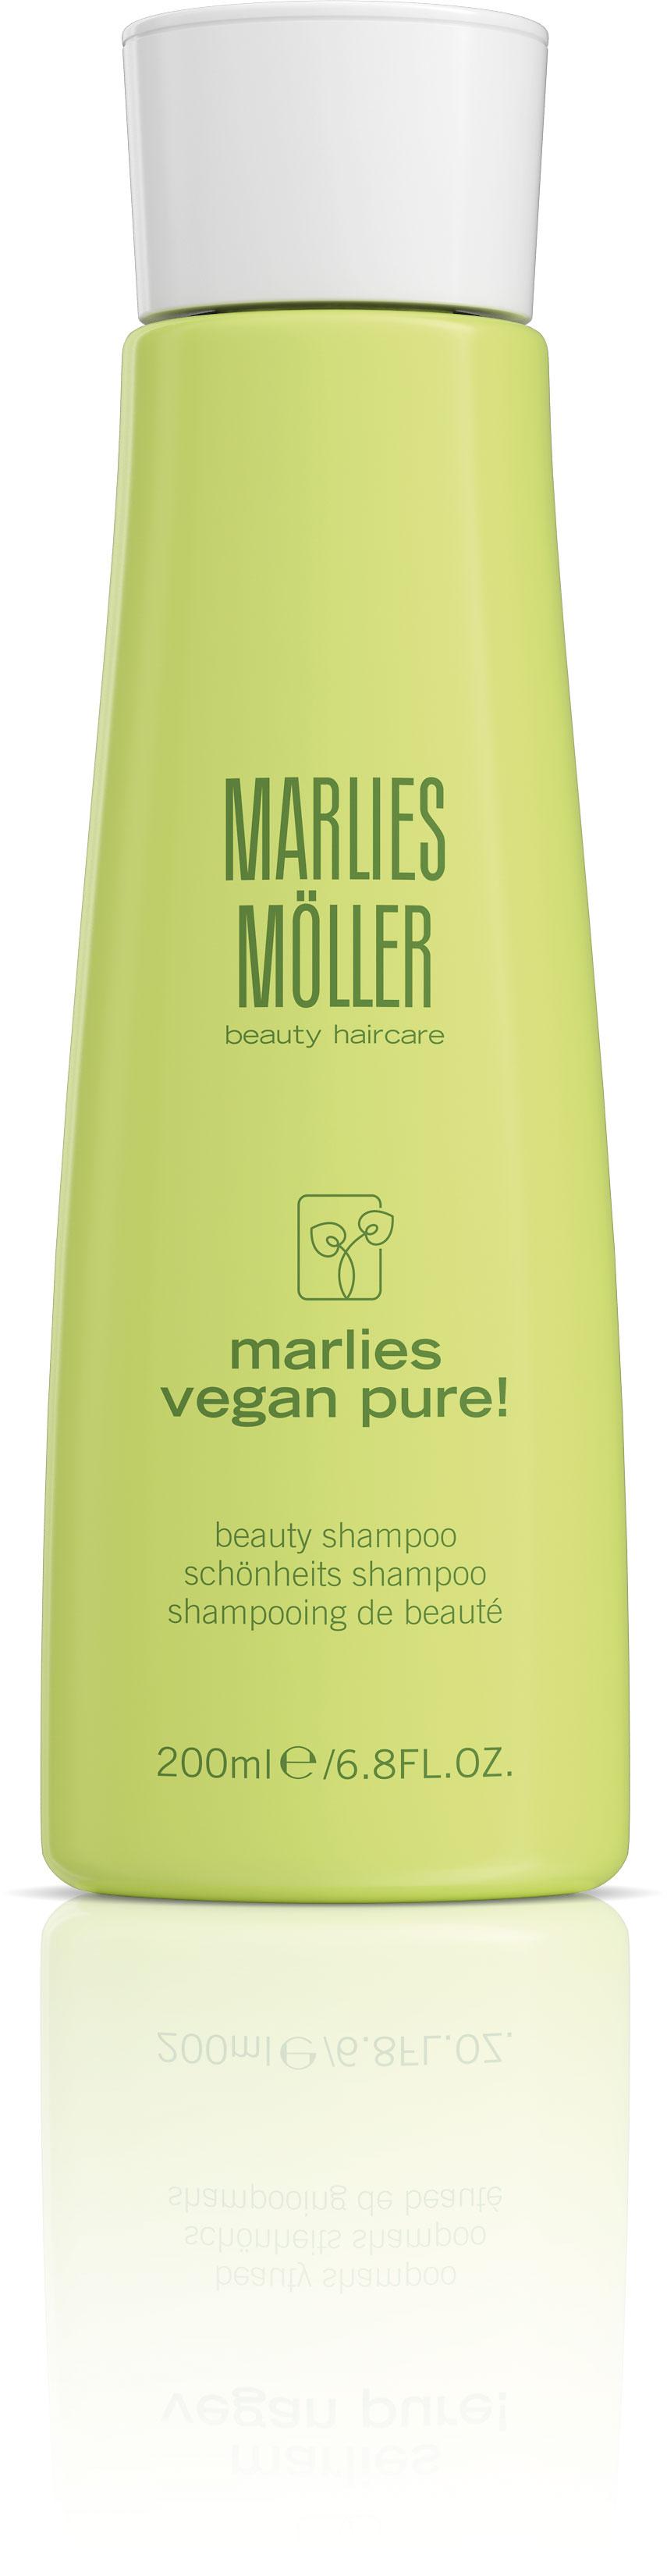 Marlies Möller Vegan Pure Beauty Shampoo 200 ml